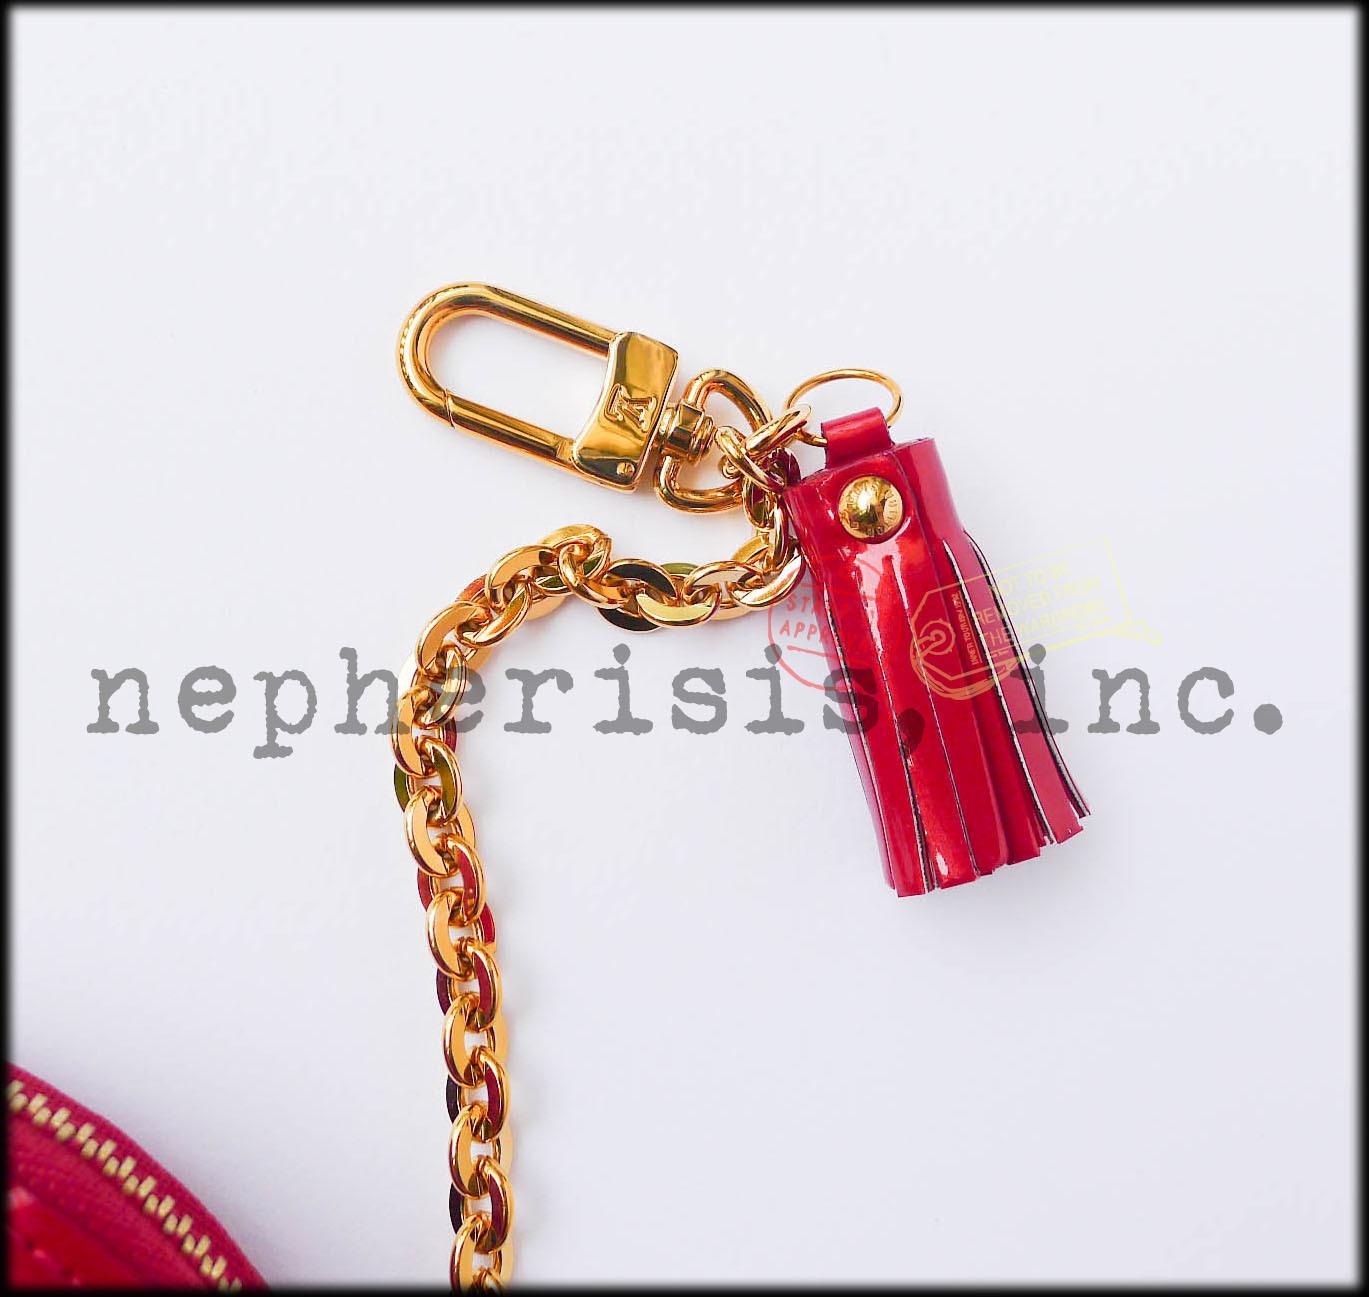 AUTH NIB Louis Vuitton ANIMANIA RABBIT Monogram Vernis Coin Purse or Bag Charm